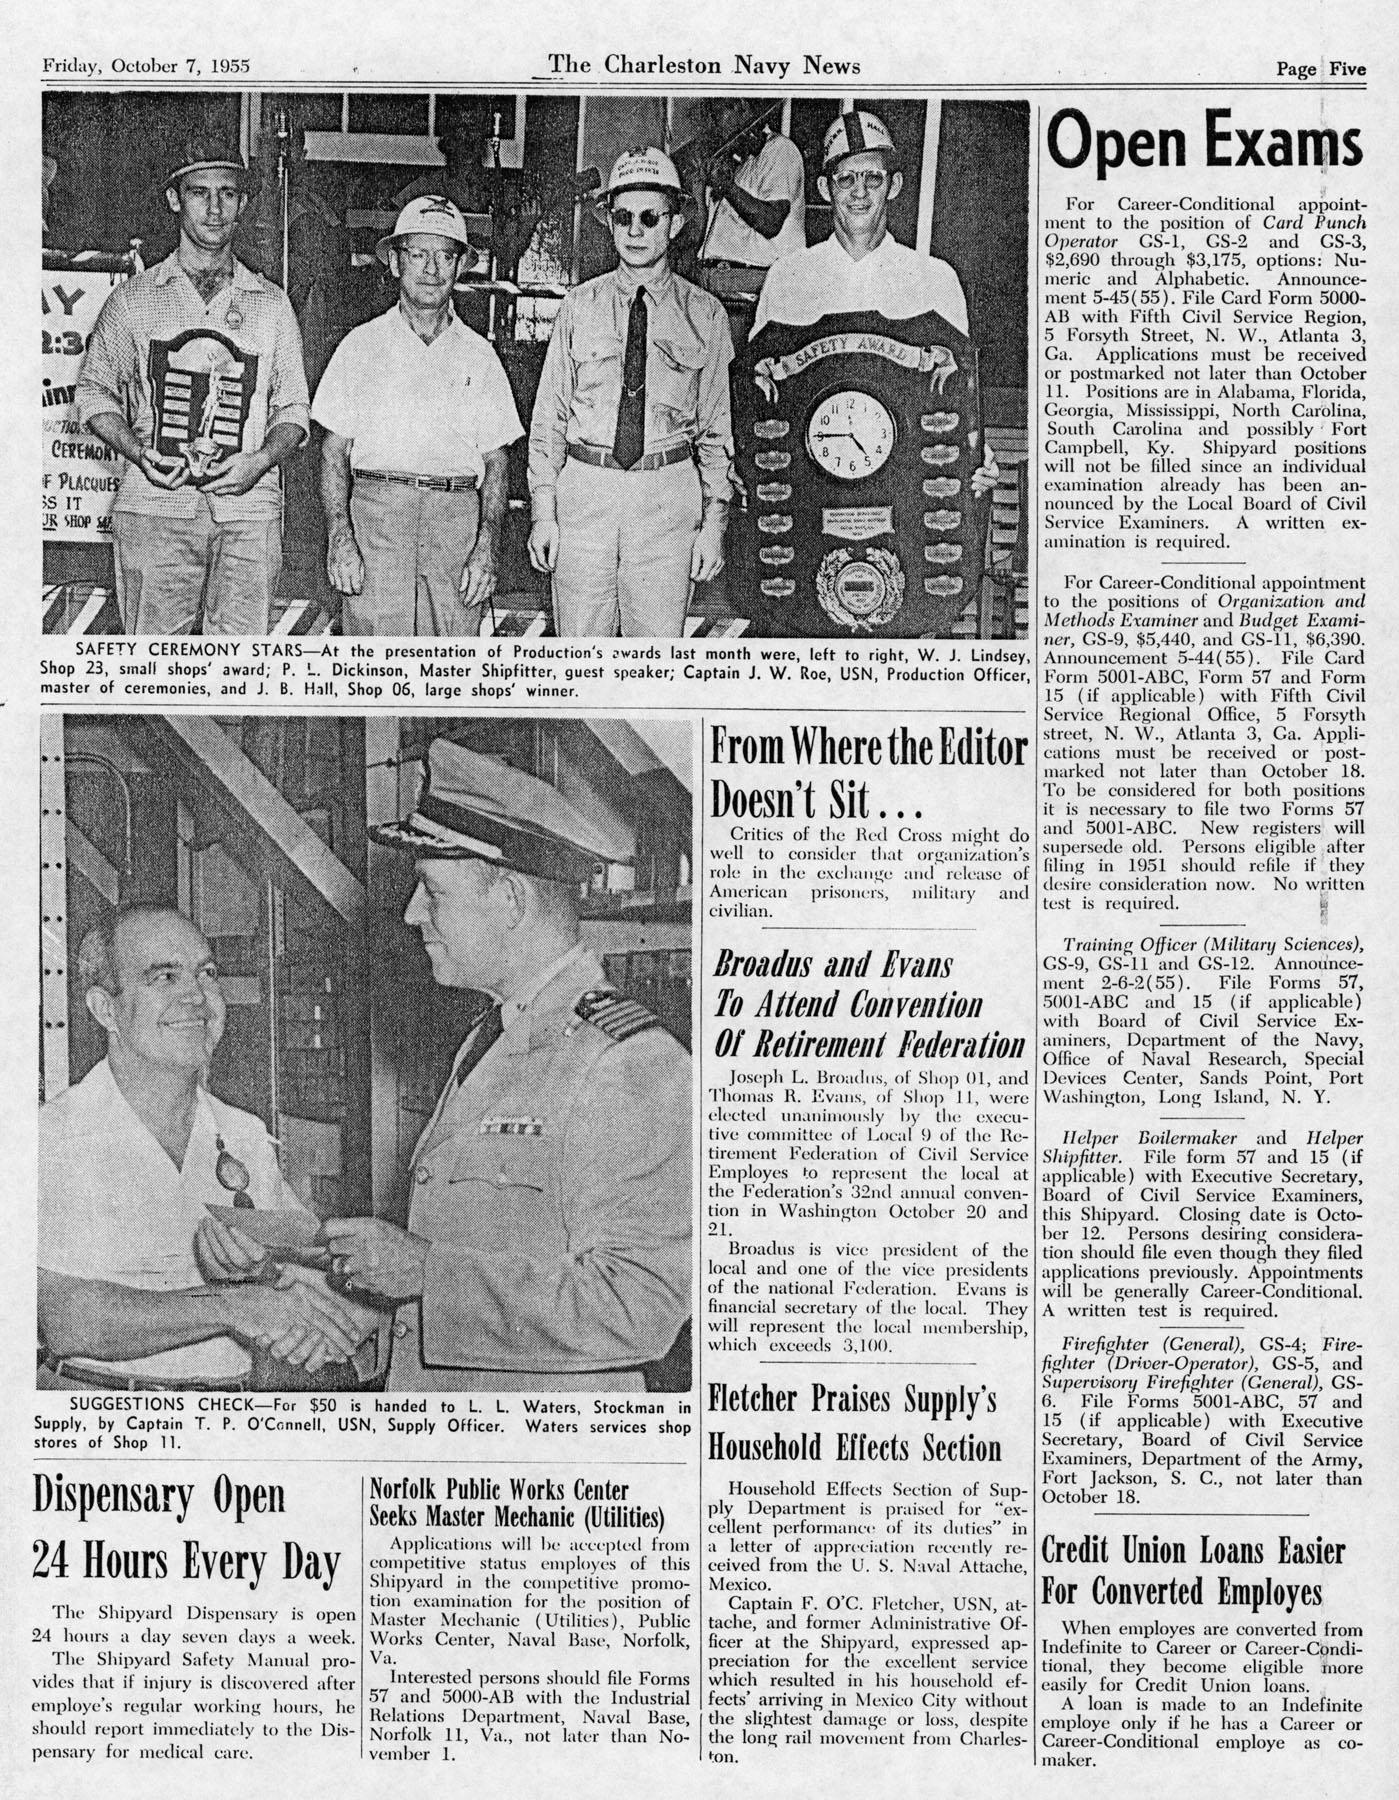 The Charleston Navy News, Volume 14, Edition 6, page v